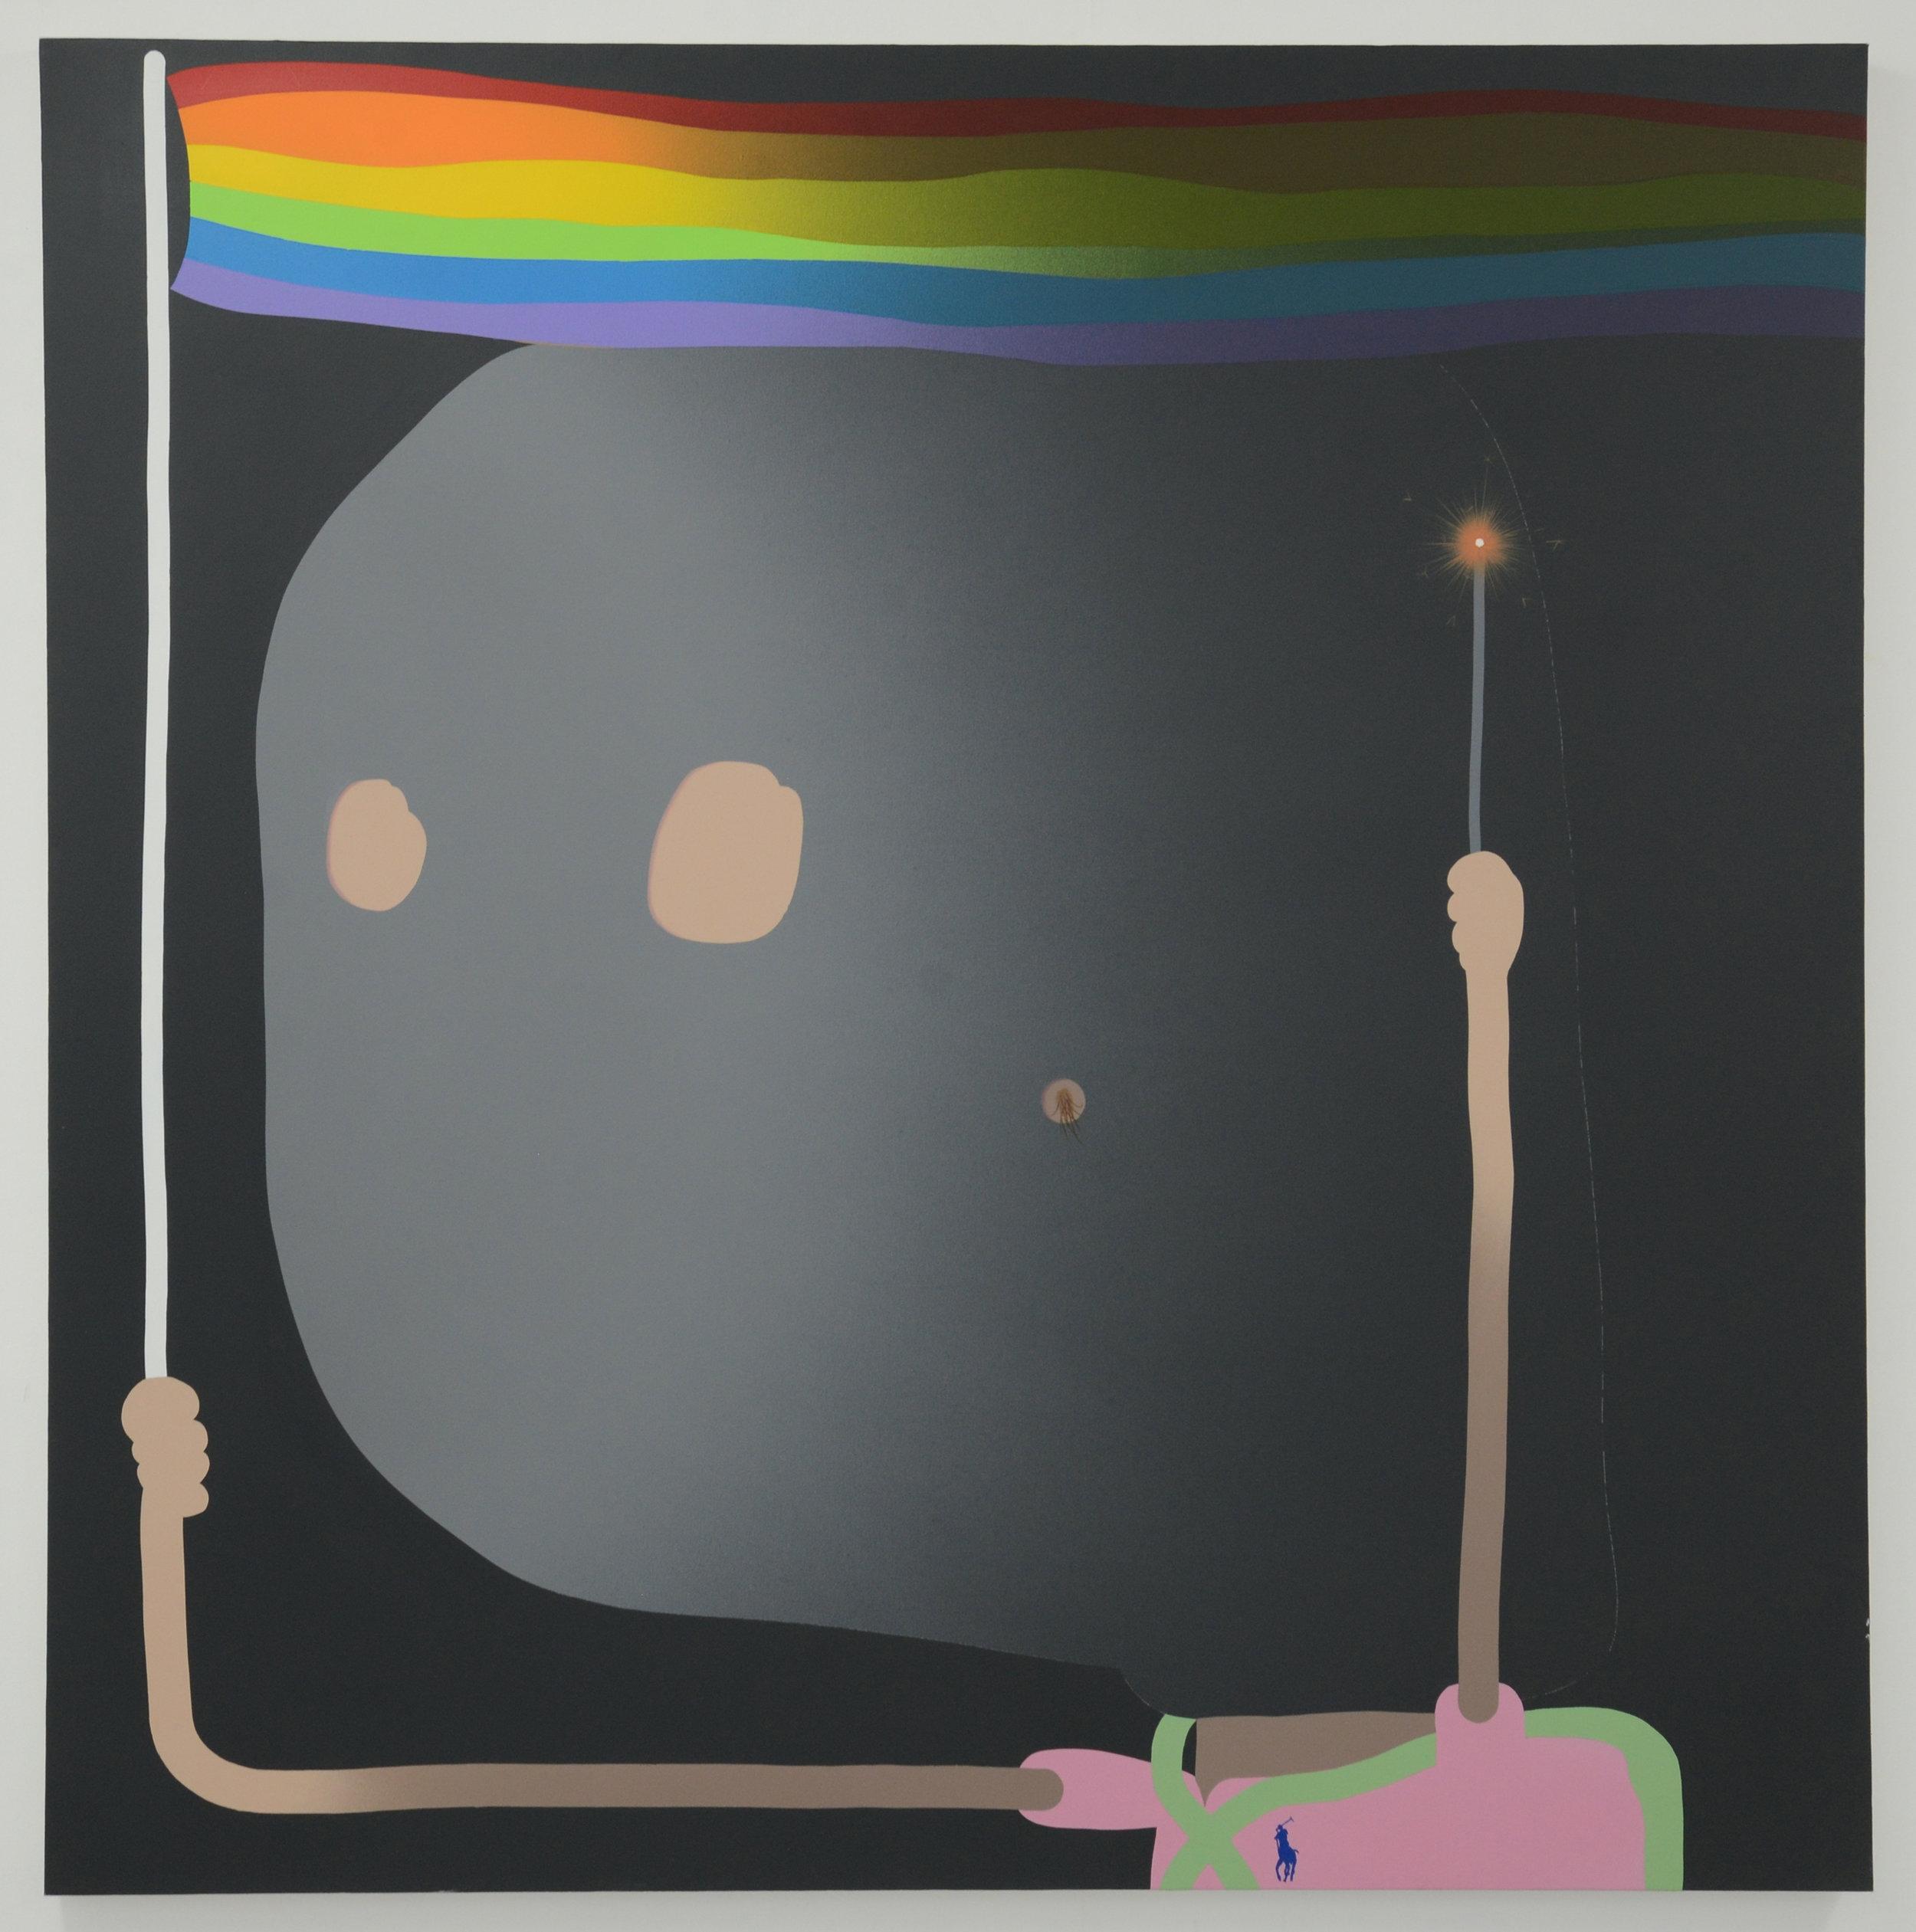 Pride, 2017, acrylic and spray paint on canvas, 120cm x 120cm